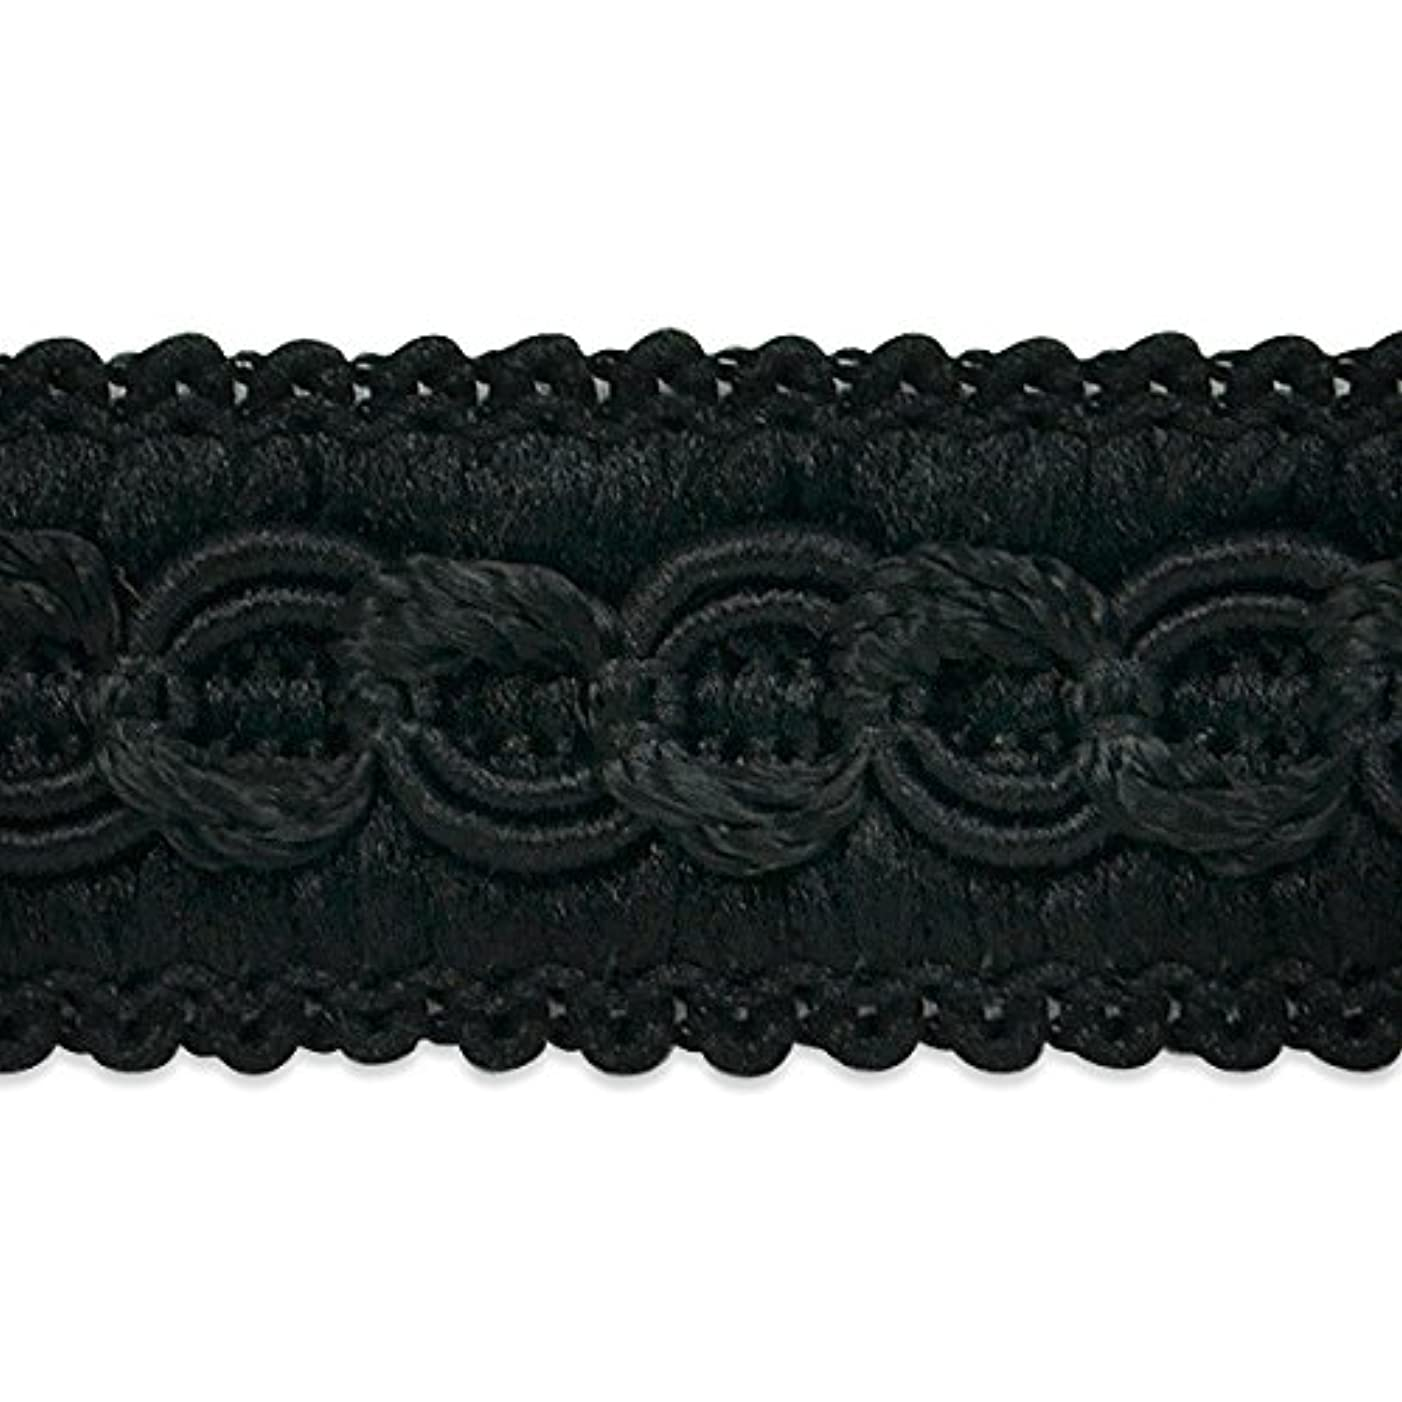 Expo International Sheena Woven Circle Braid Trim Embellishment, 20-Yard, Black